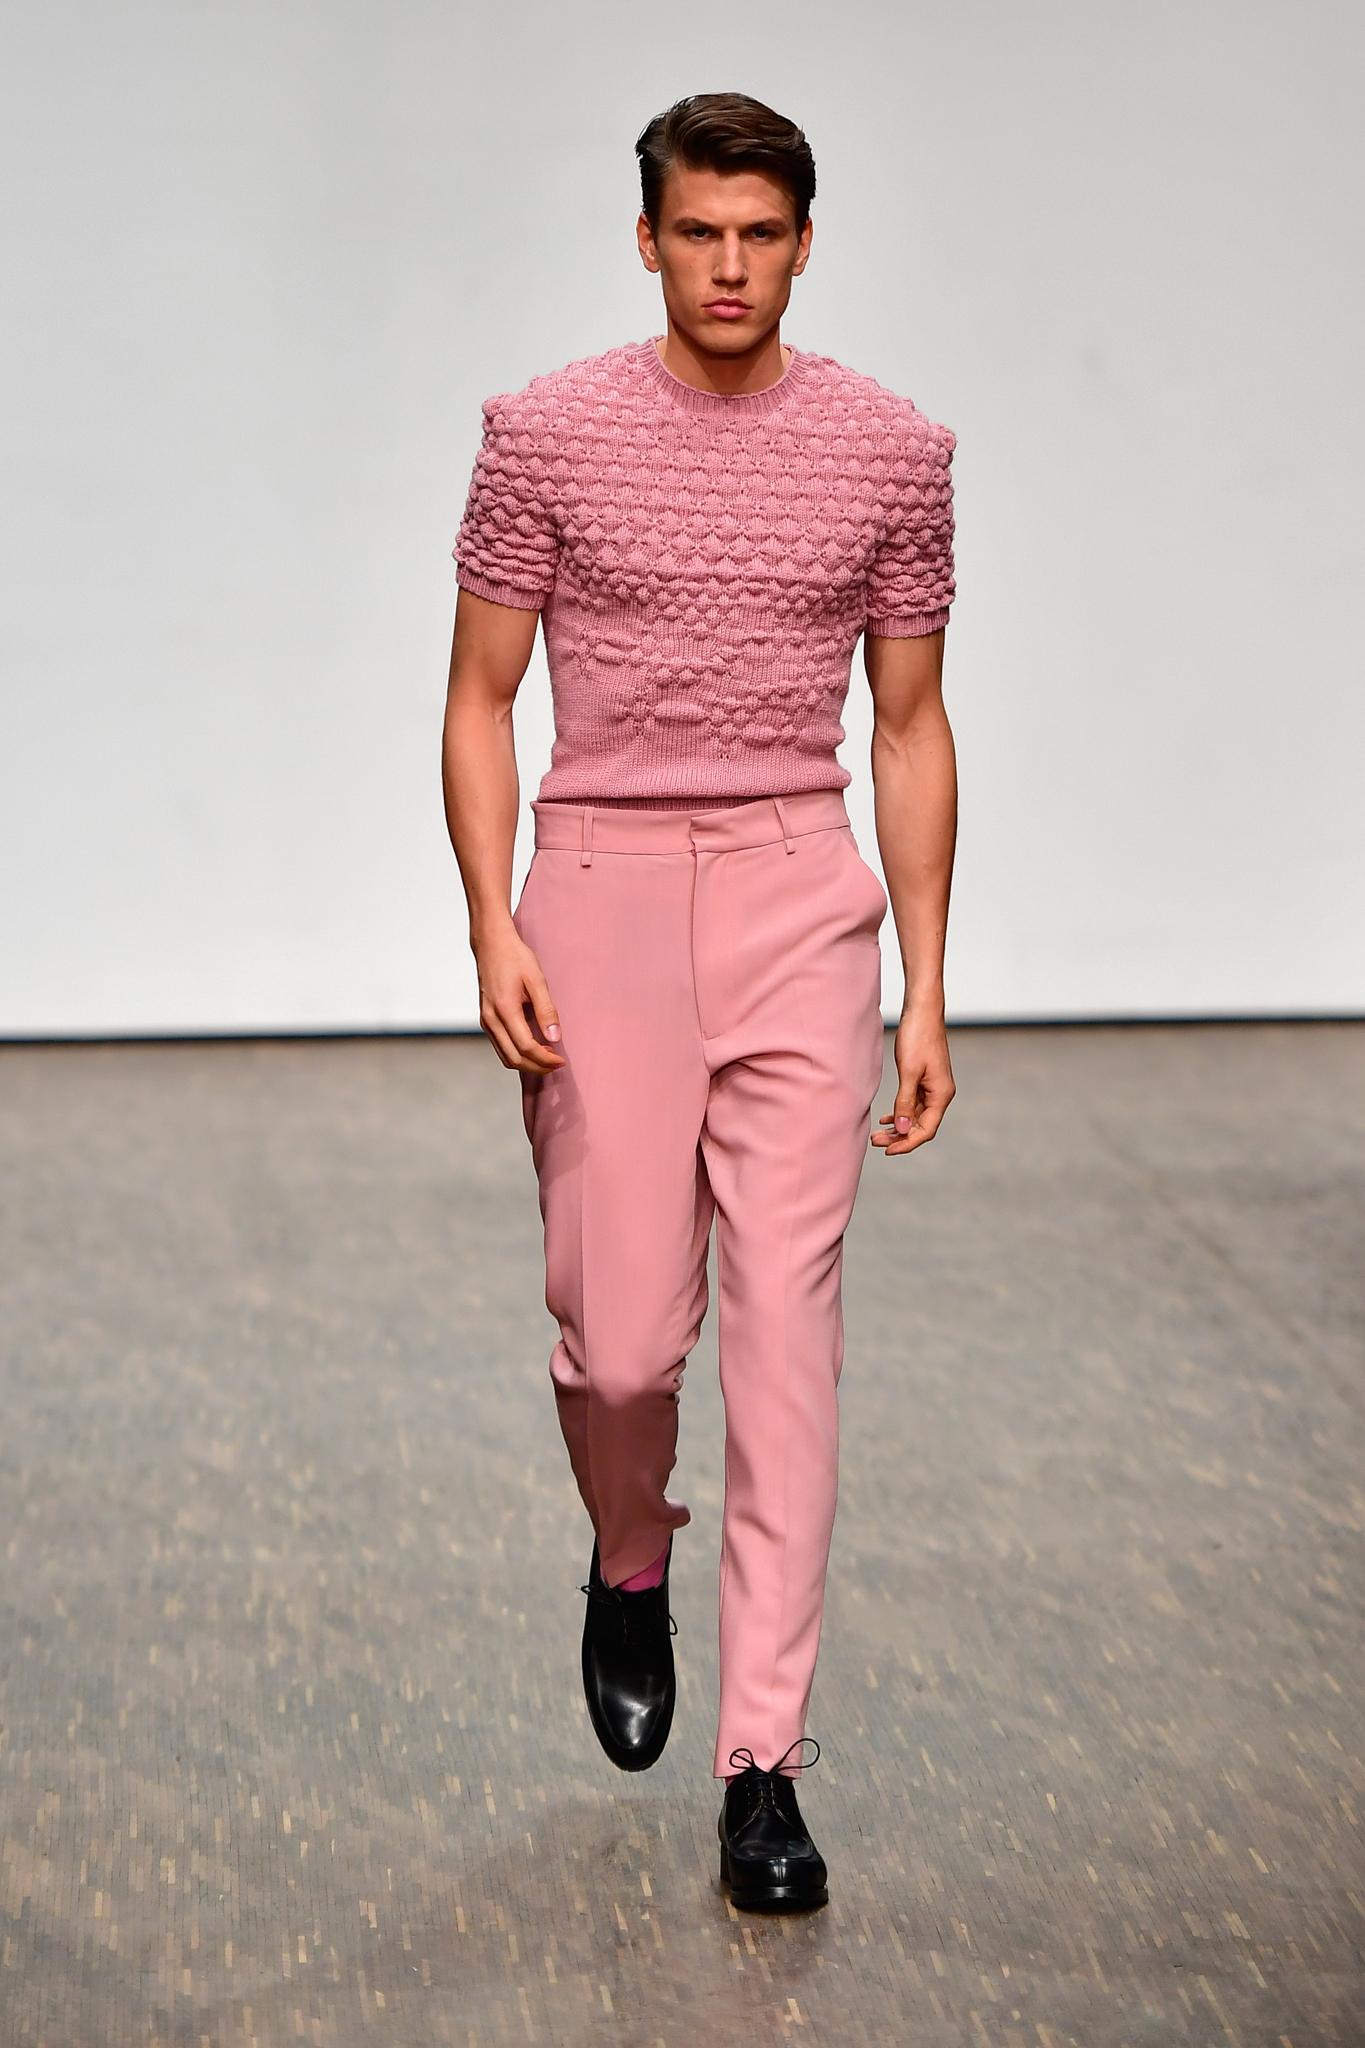 Ivanman - Mercedes-Benz Fashion Week Berlin S/S 2017